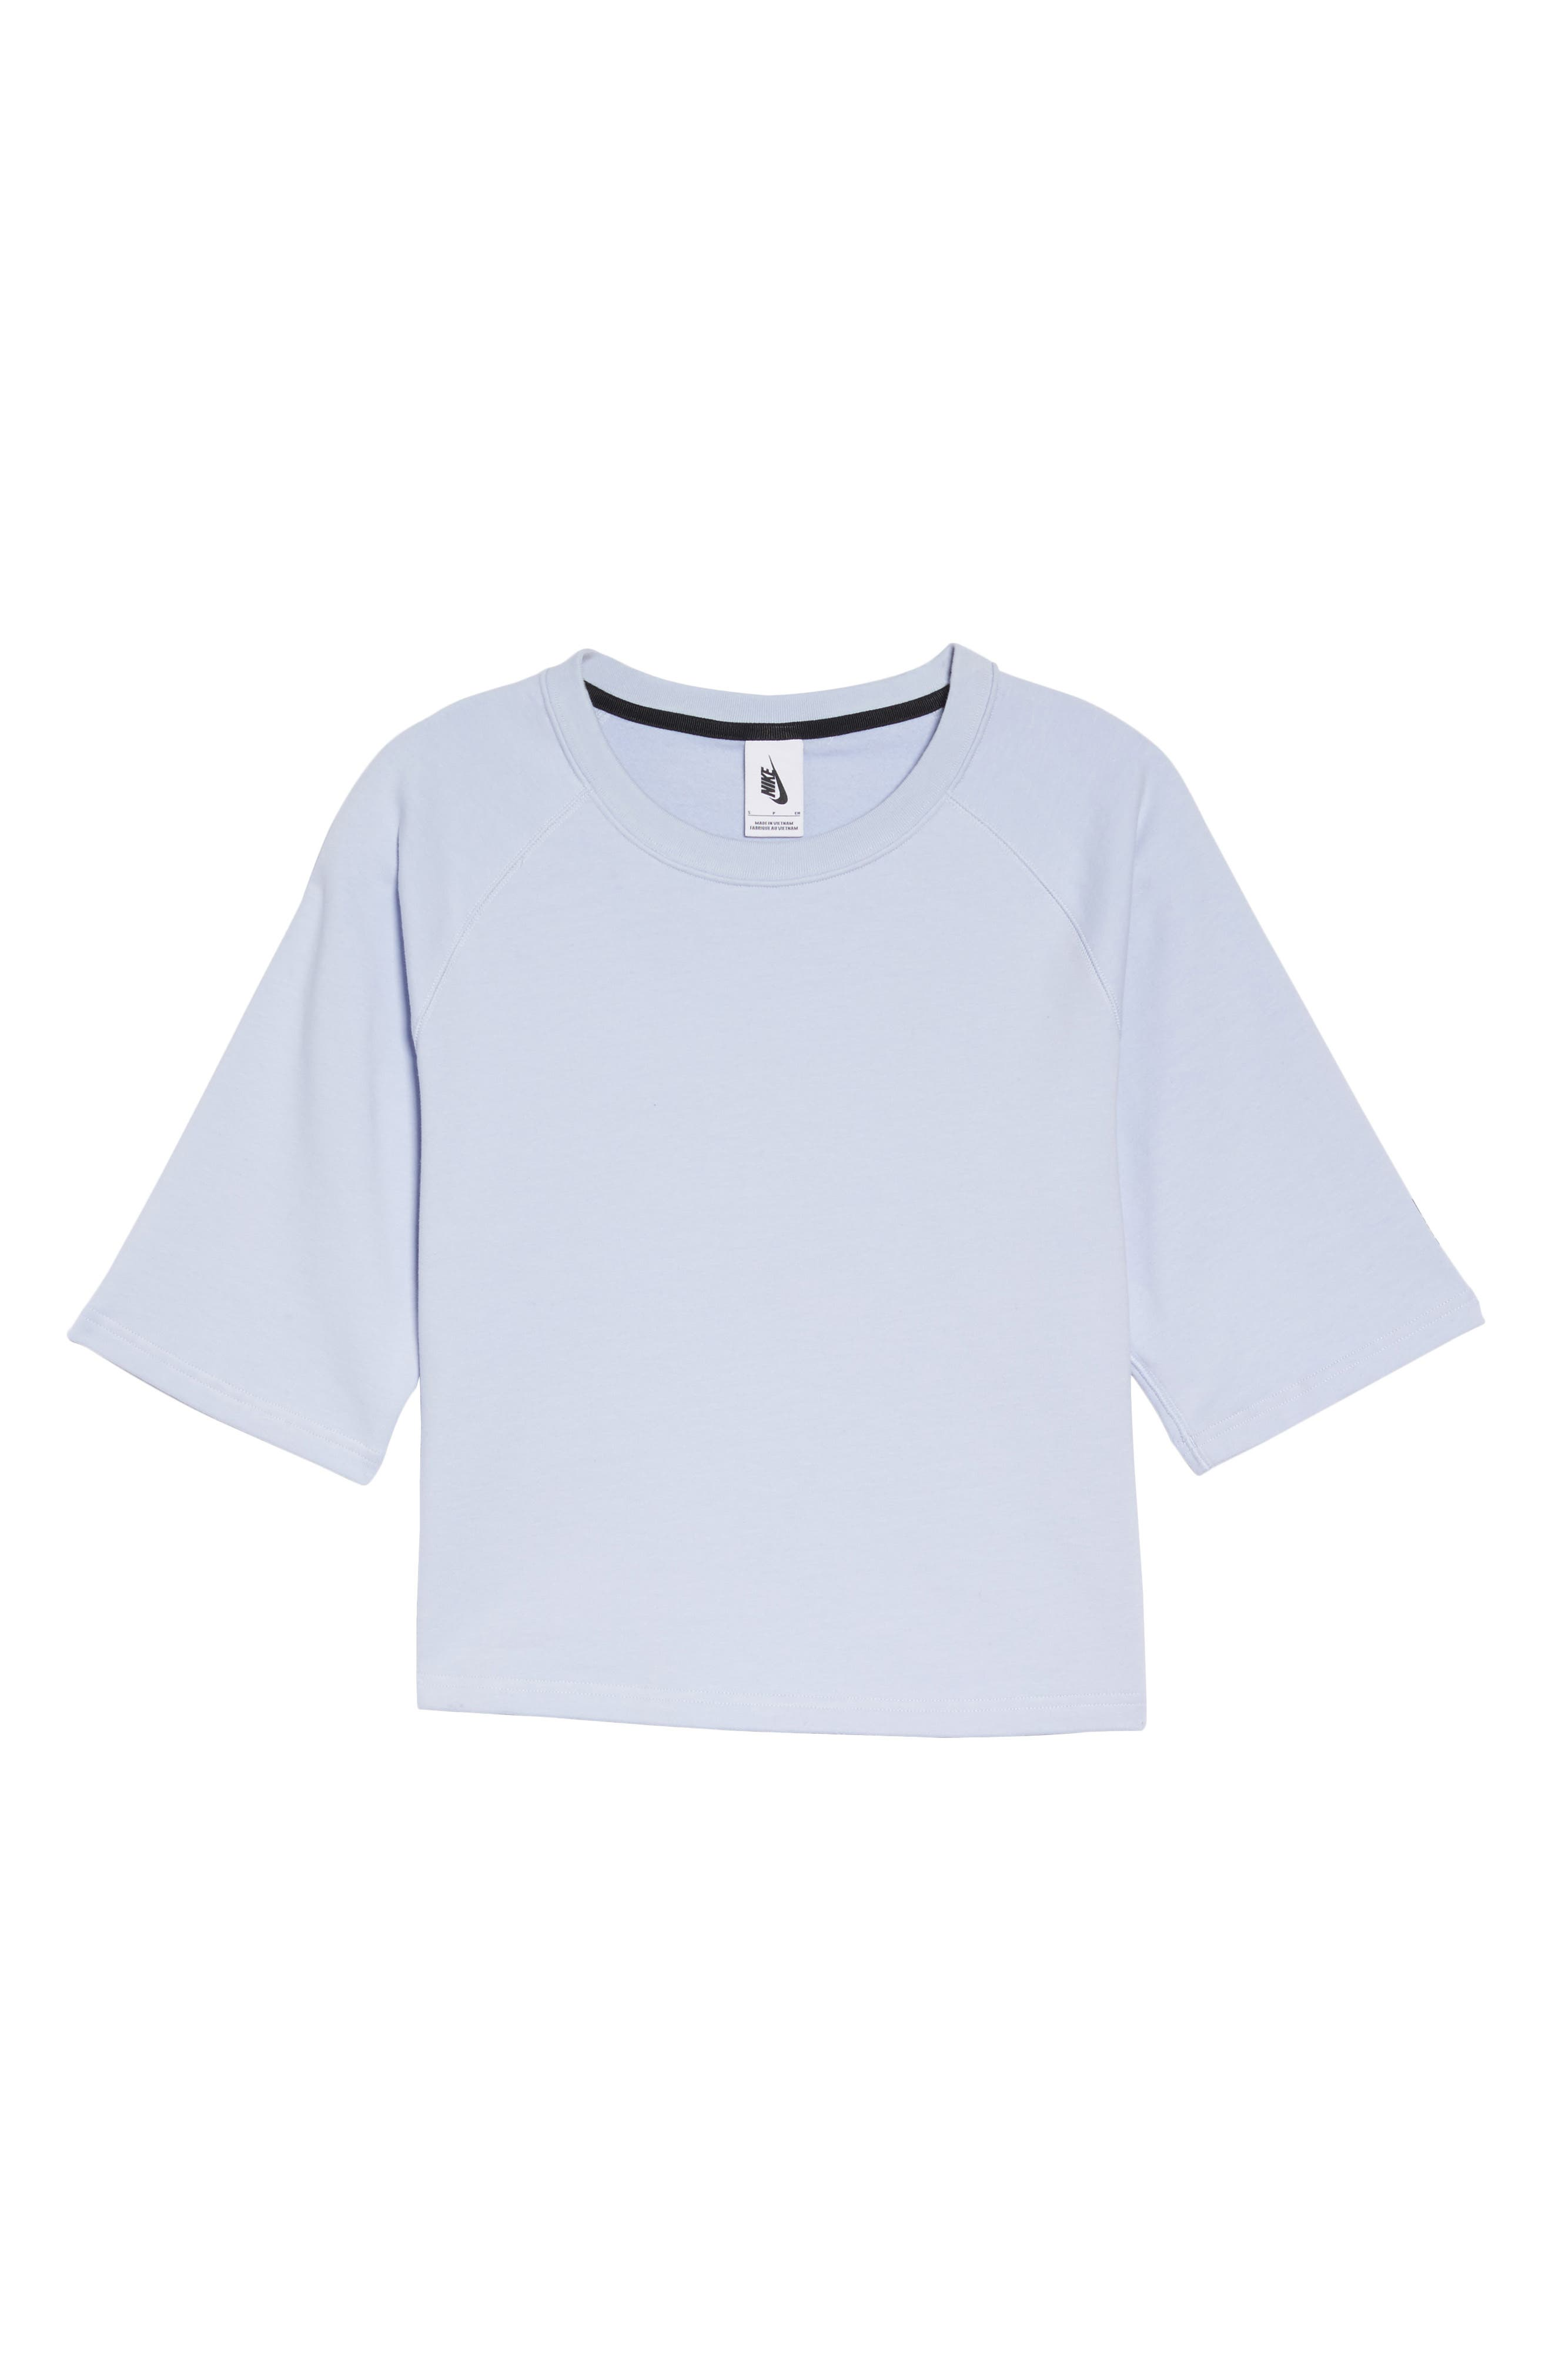 NikeLab Essential Fleece Top,                             Alternate thumbnail 17, color,